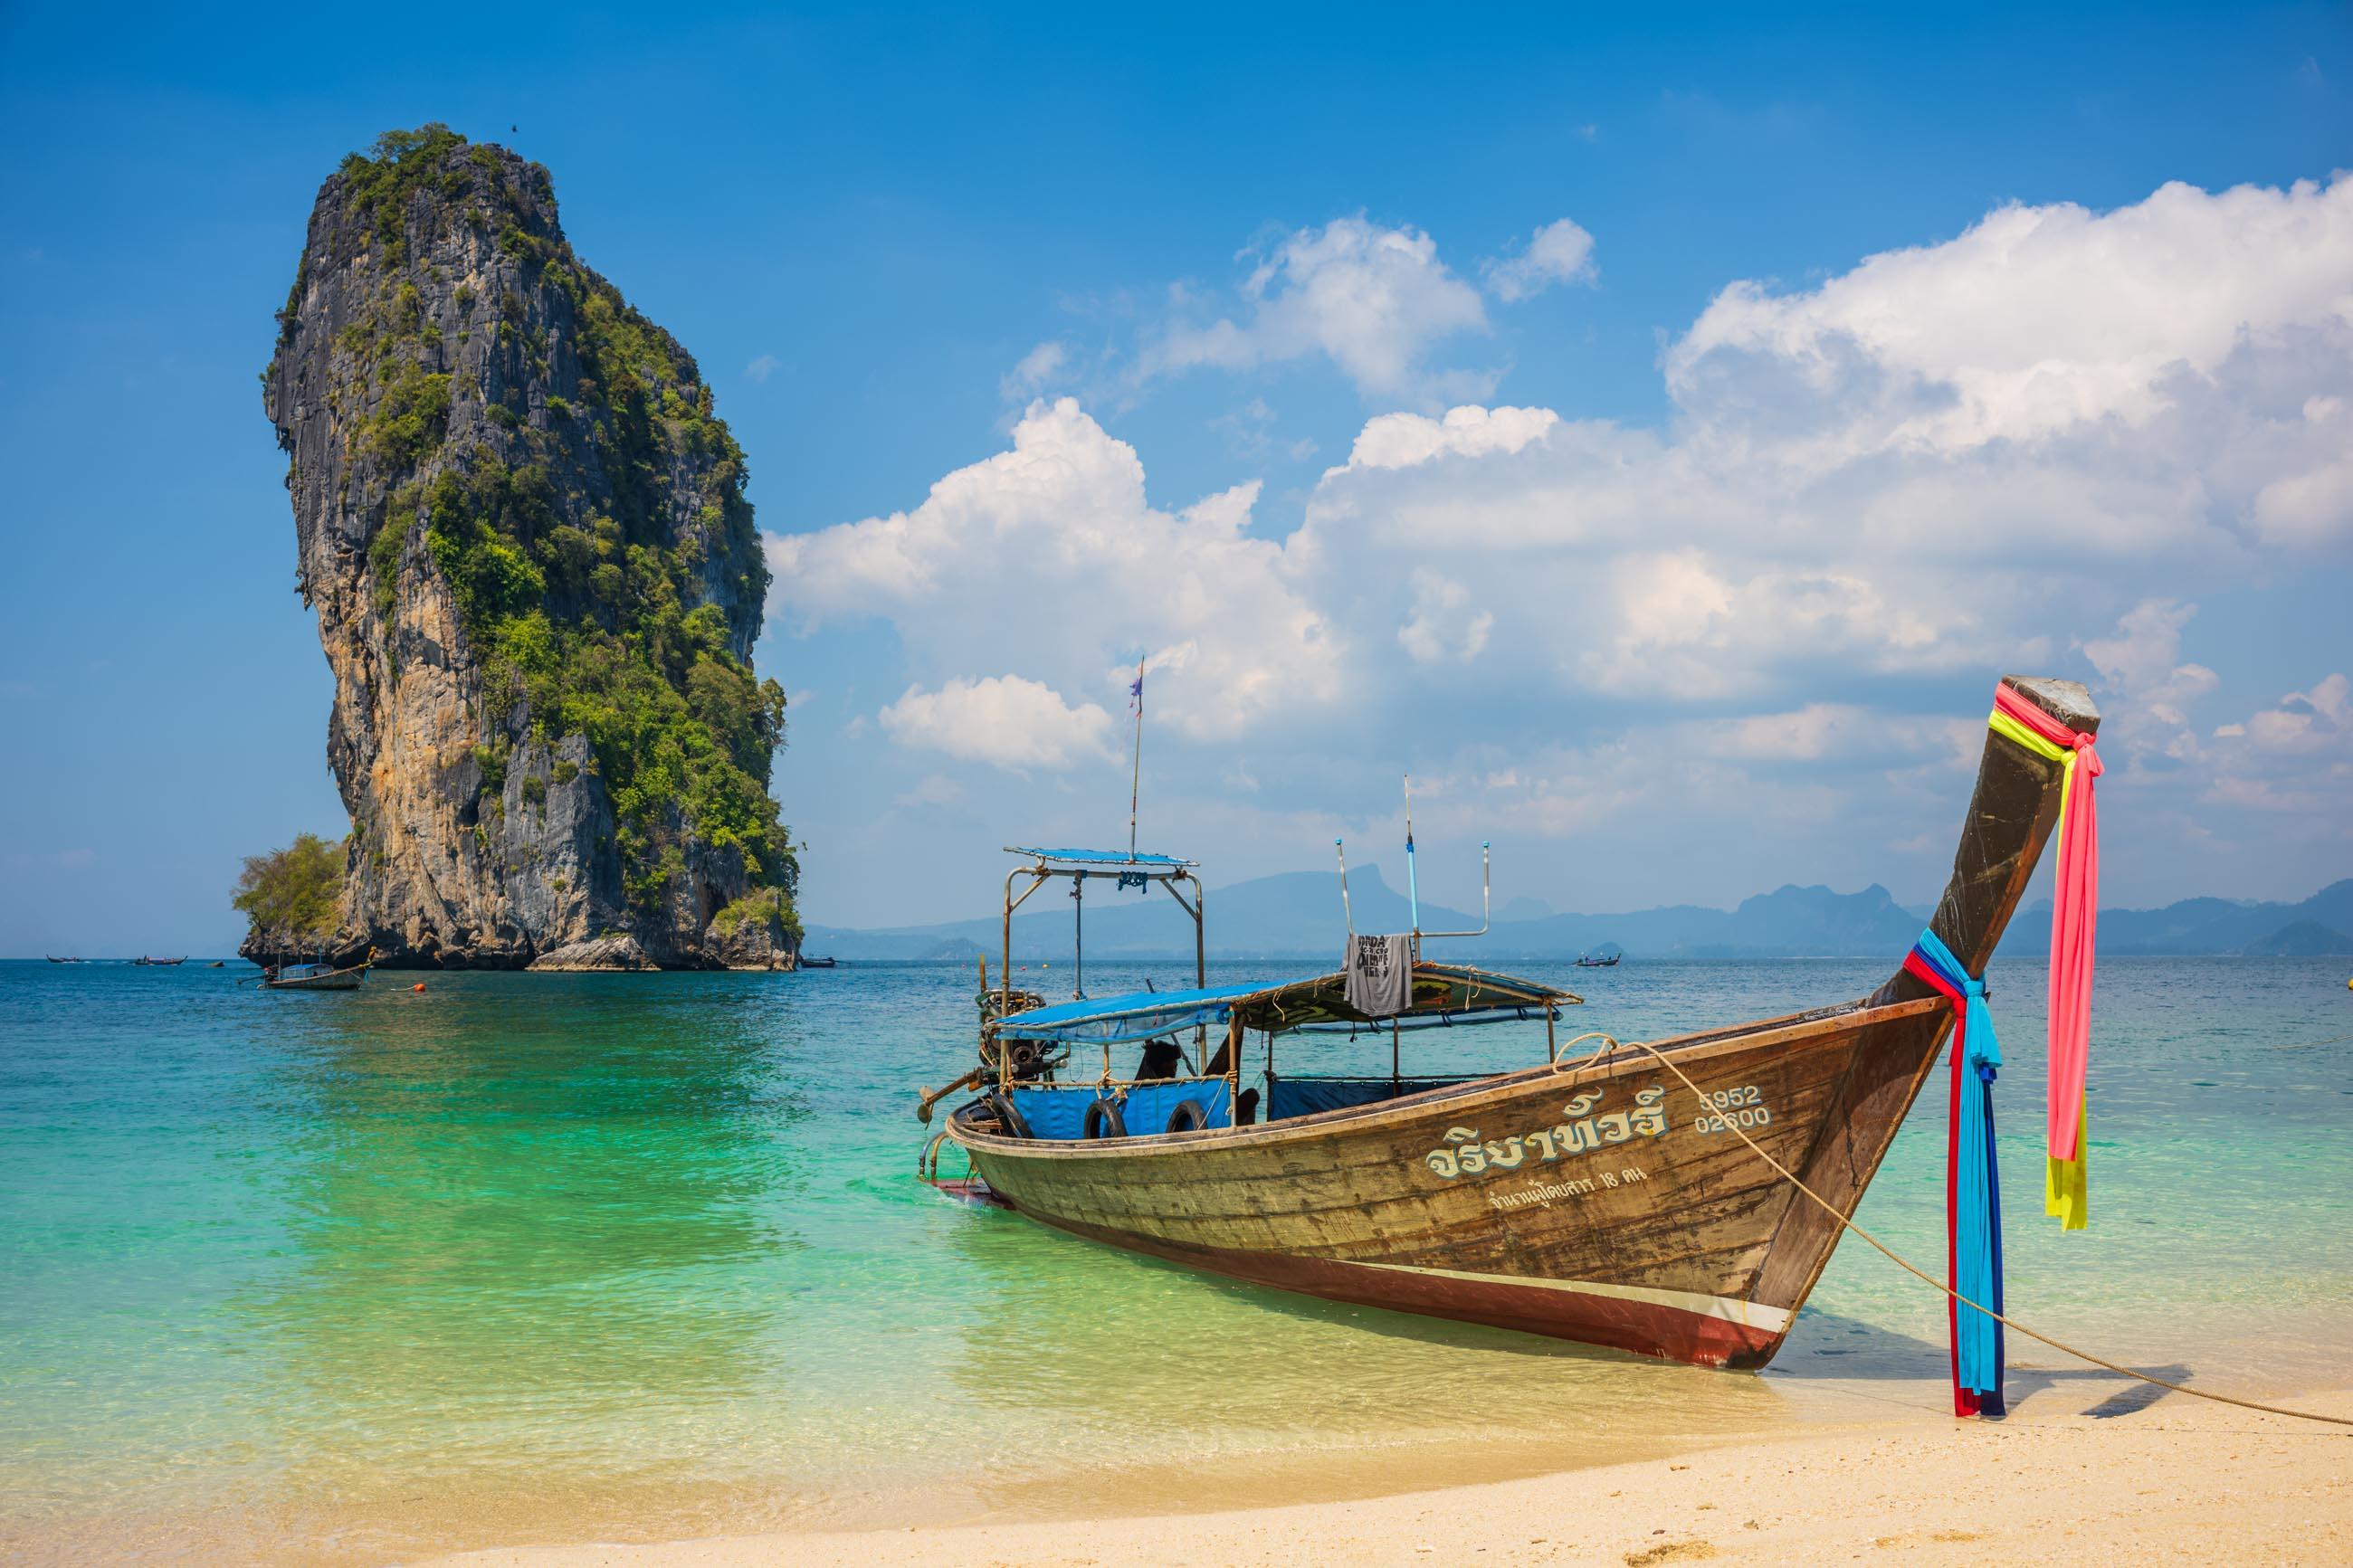 https://bubo.sk/uploads/galleries/5062/robotaraba_thajsko_krabi_plaze-2-.jpg